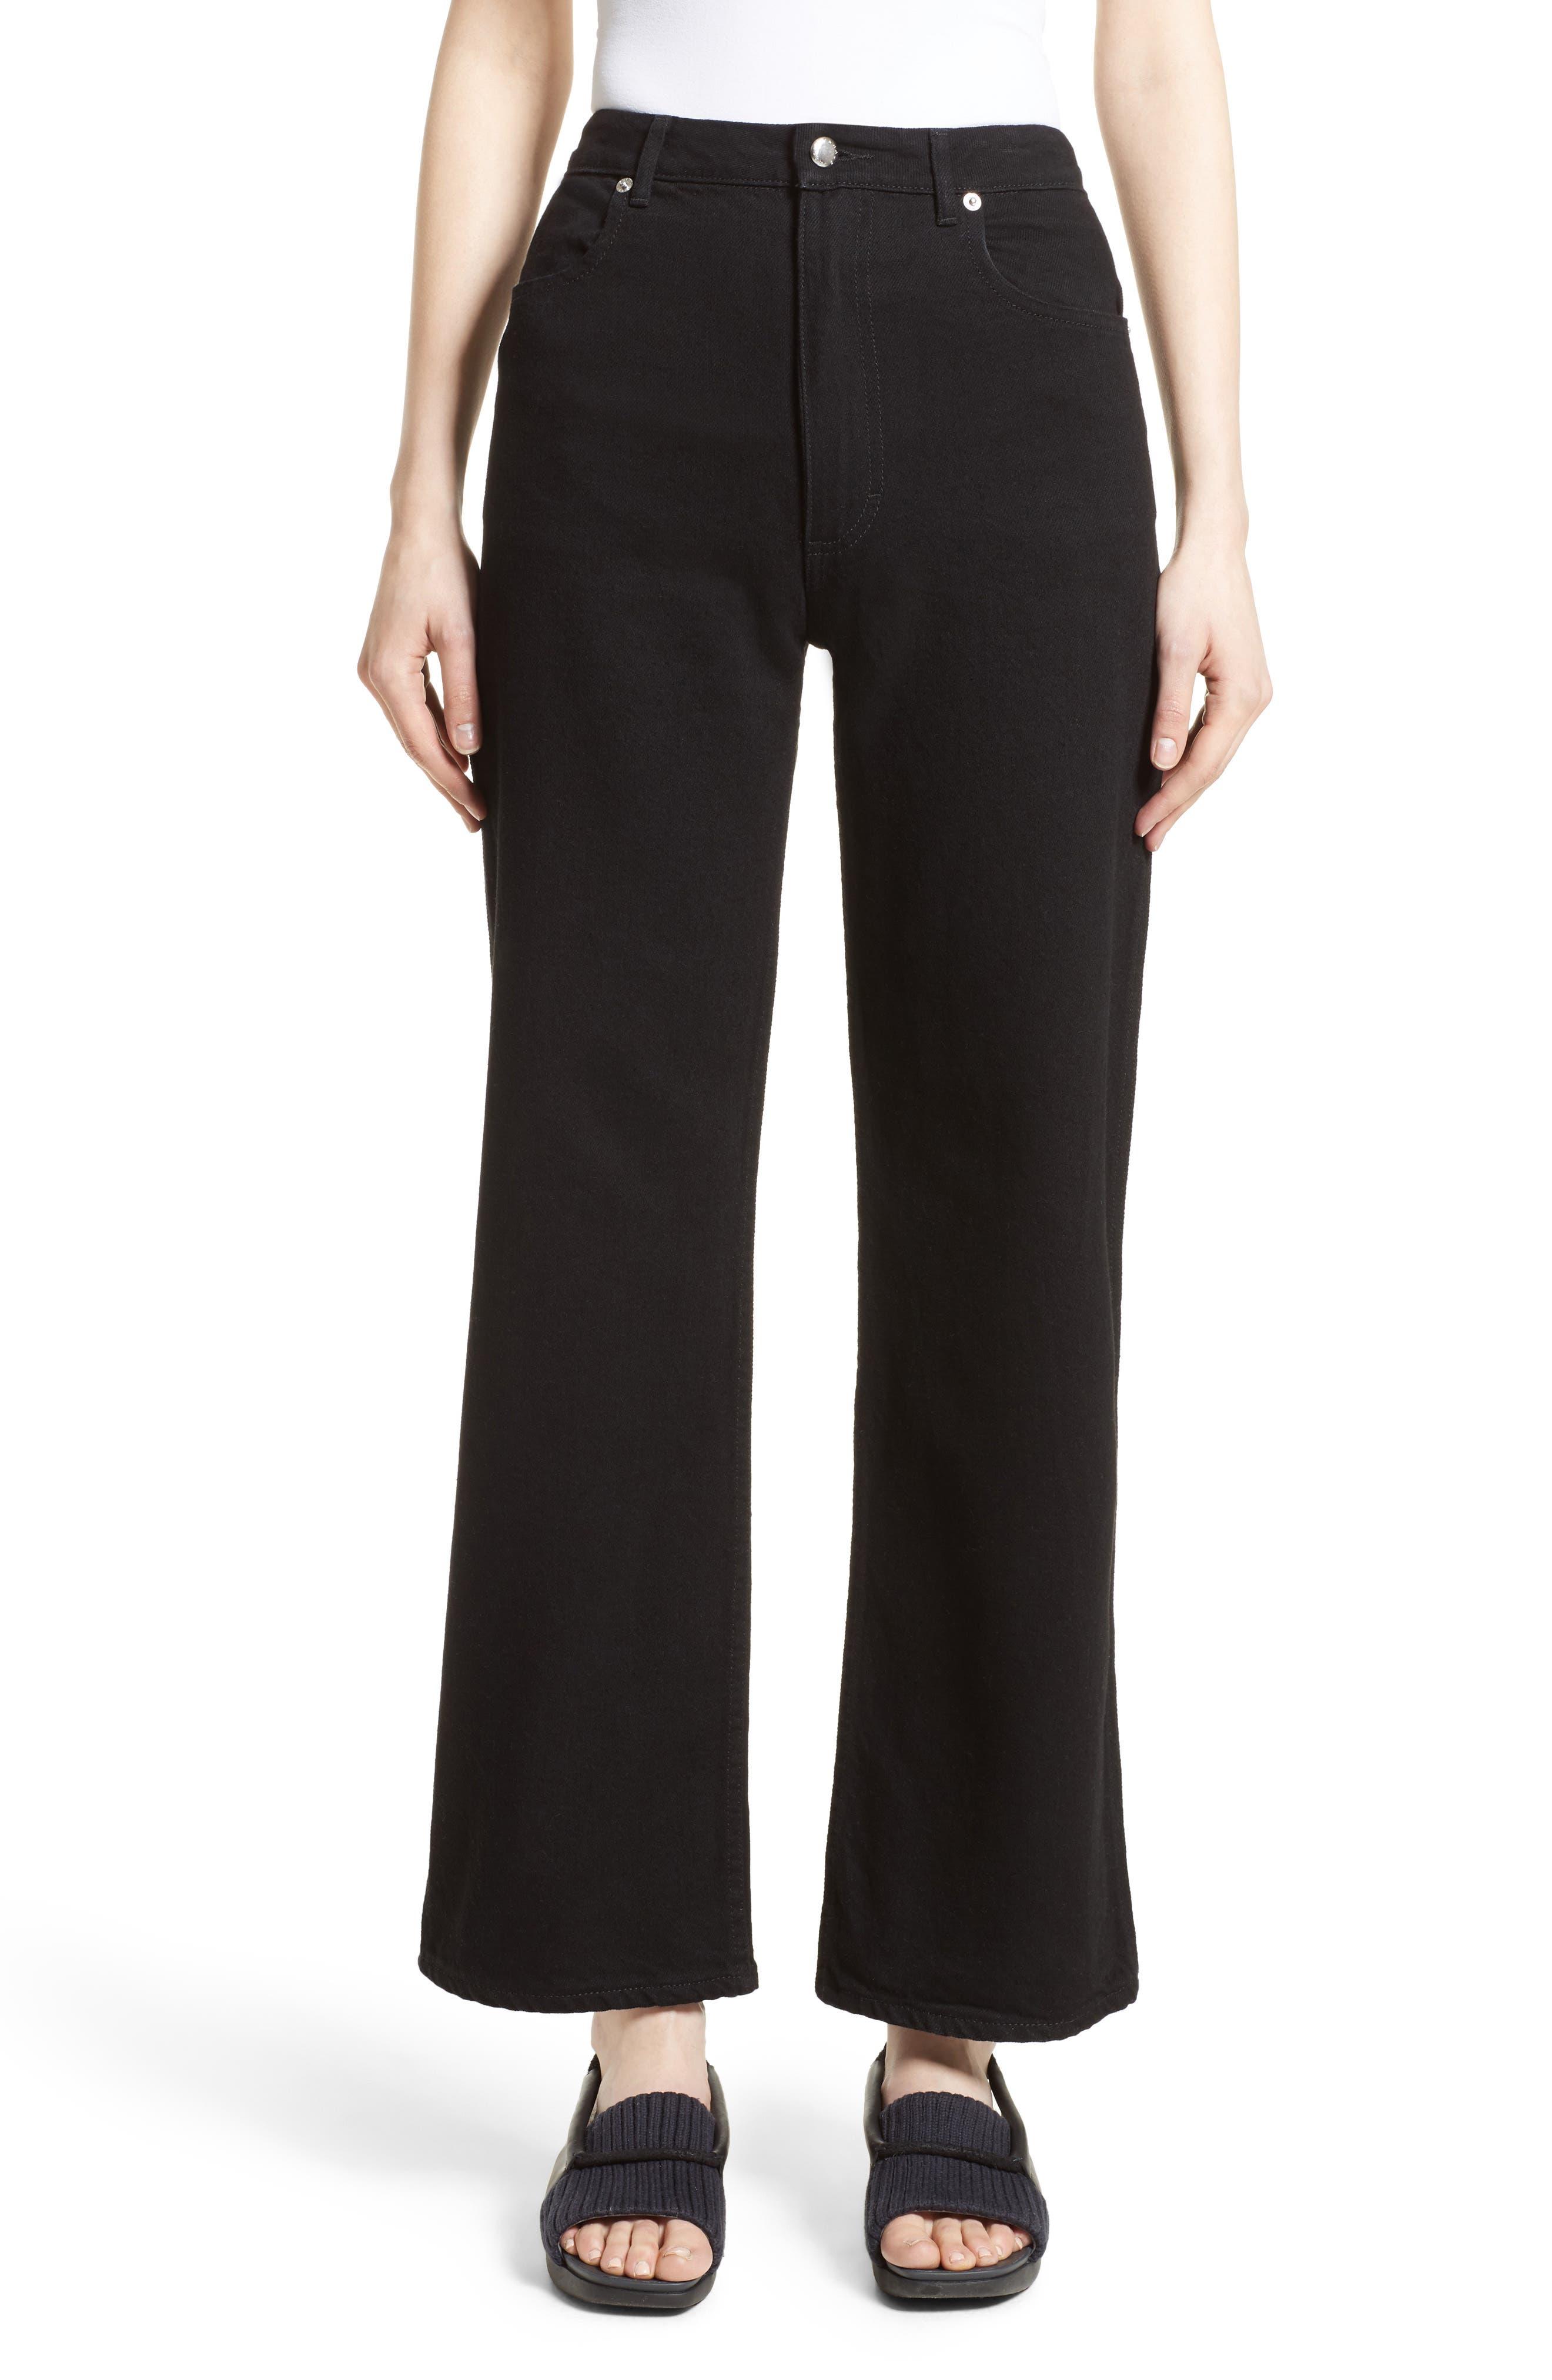 Alternate Image 1 Selected - Eckhaus Latta EL Wide Leg Jeans (Almost Black)